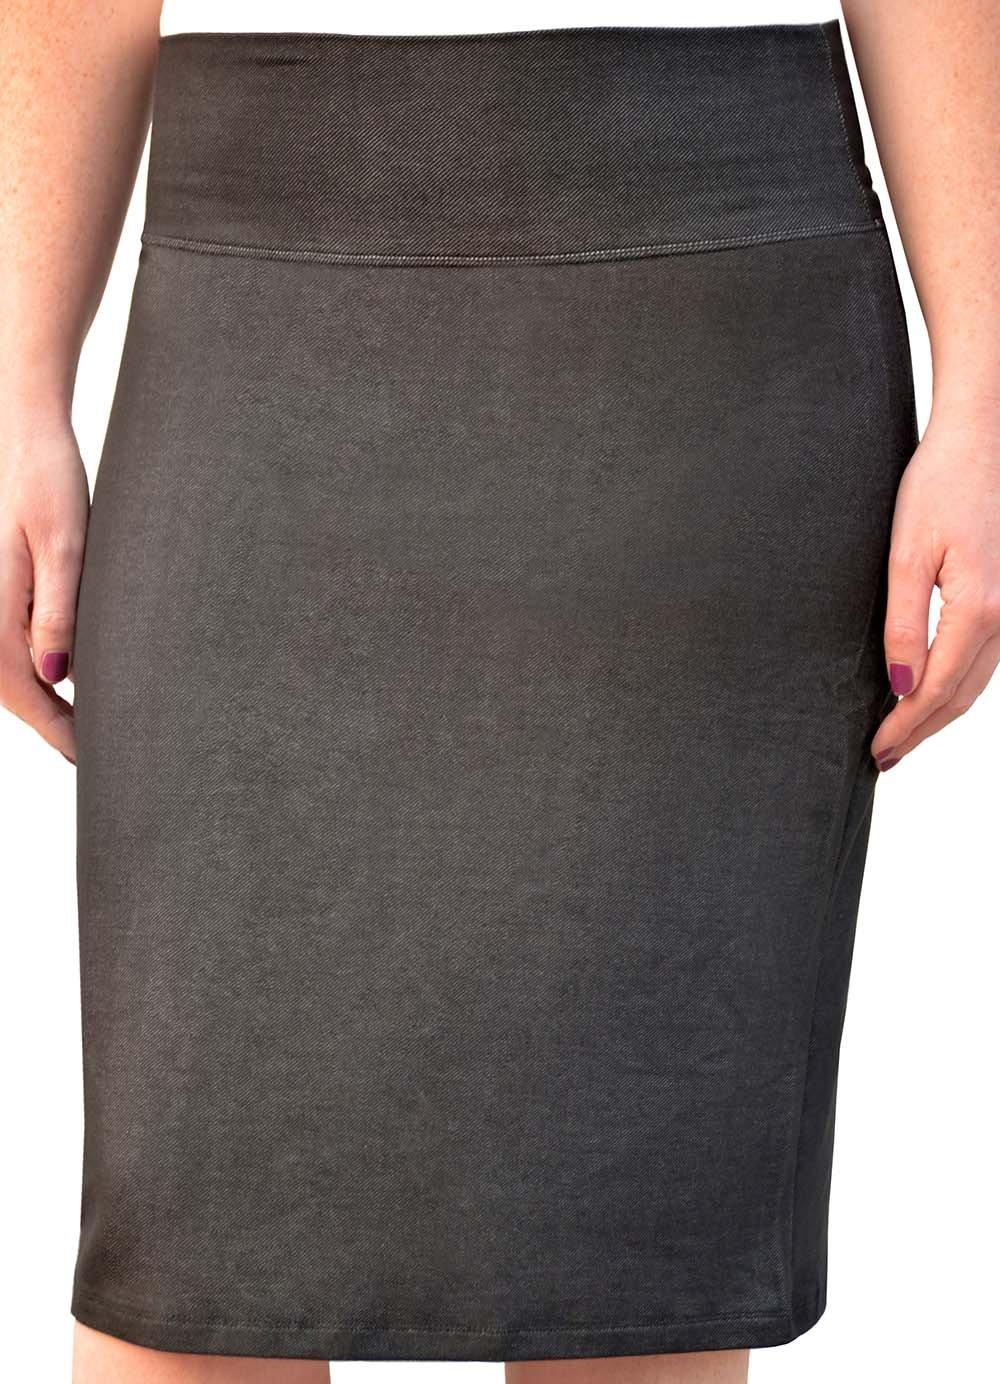 Kosher Casual Women's Modest Knee Length Denim Look Knit Pencil Skirt Small Black